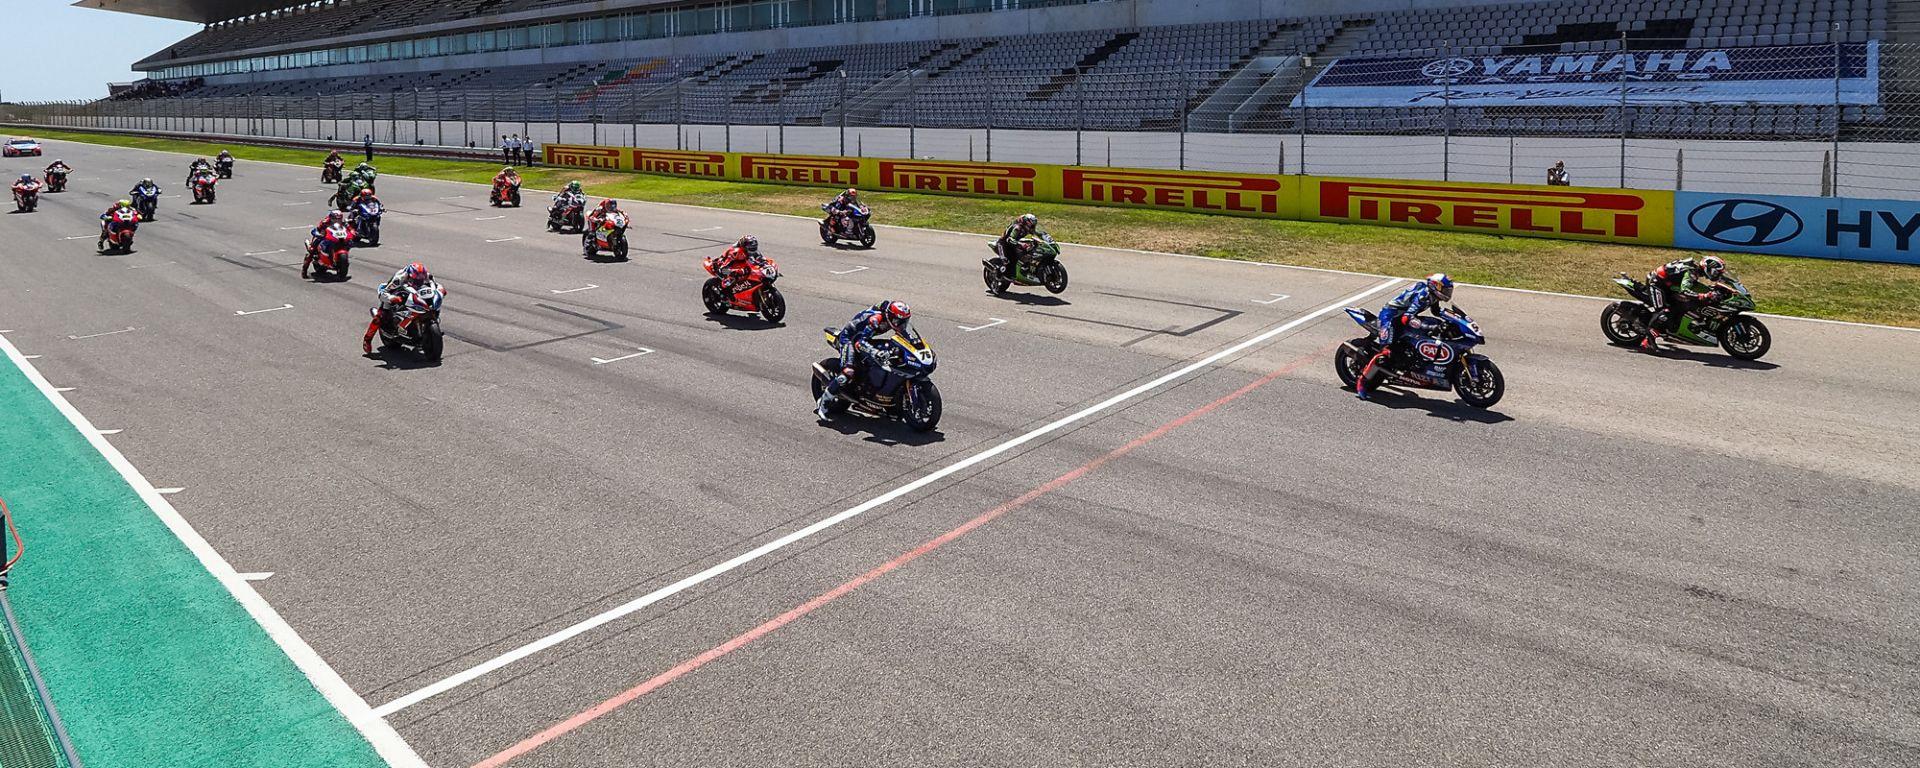 Superbike 2021: classifica piloti e costruttori